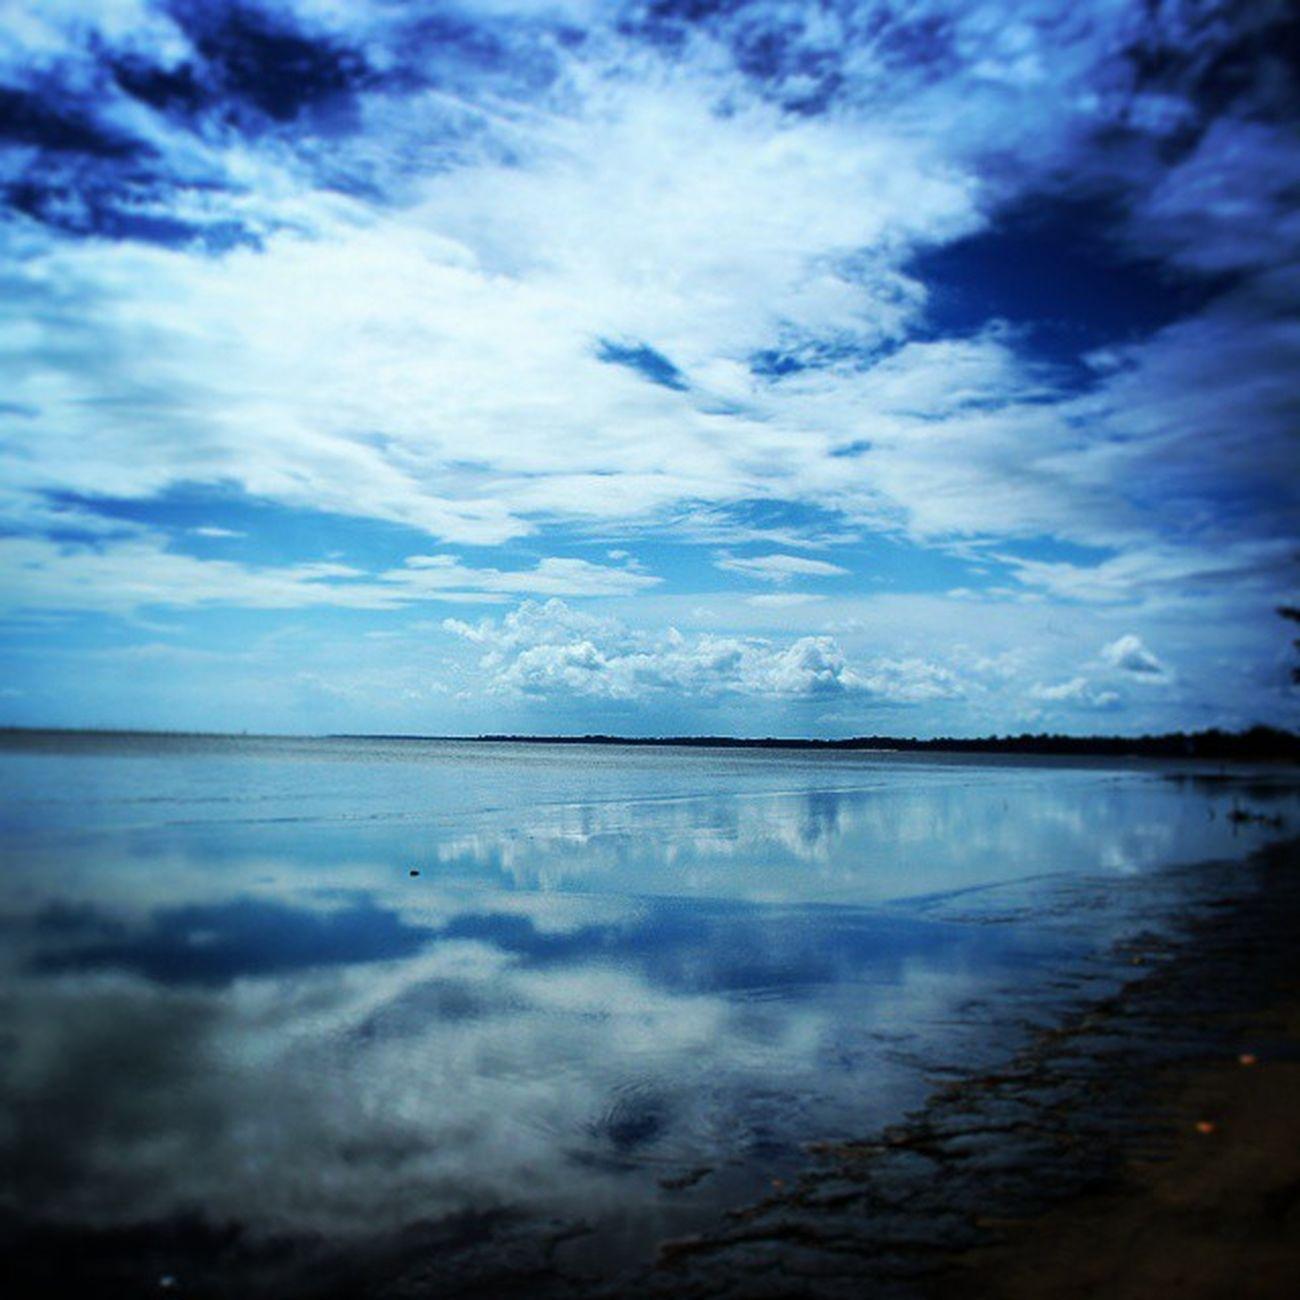 Langitnya bikin rindu. Sayang mirrornya kurang Mirror Beach Ins Travelling Borneo Pankalanbun